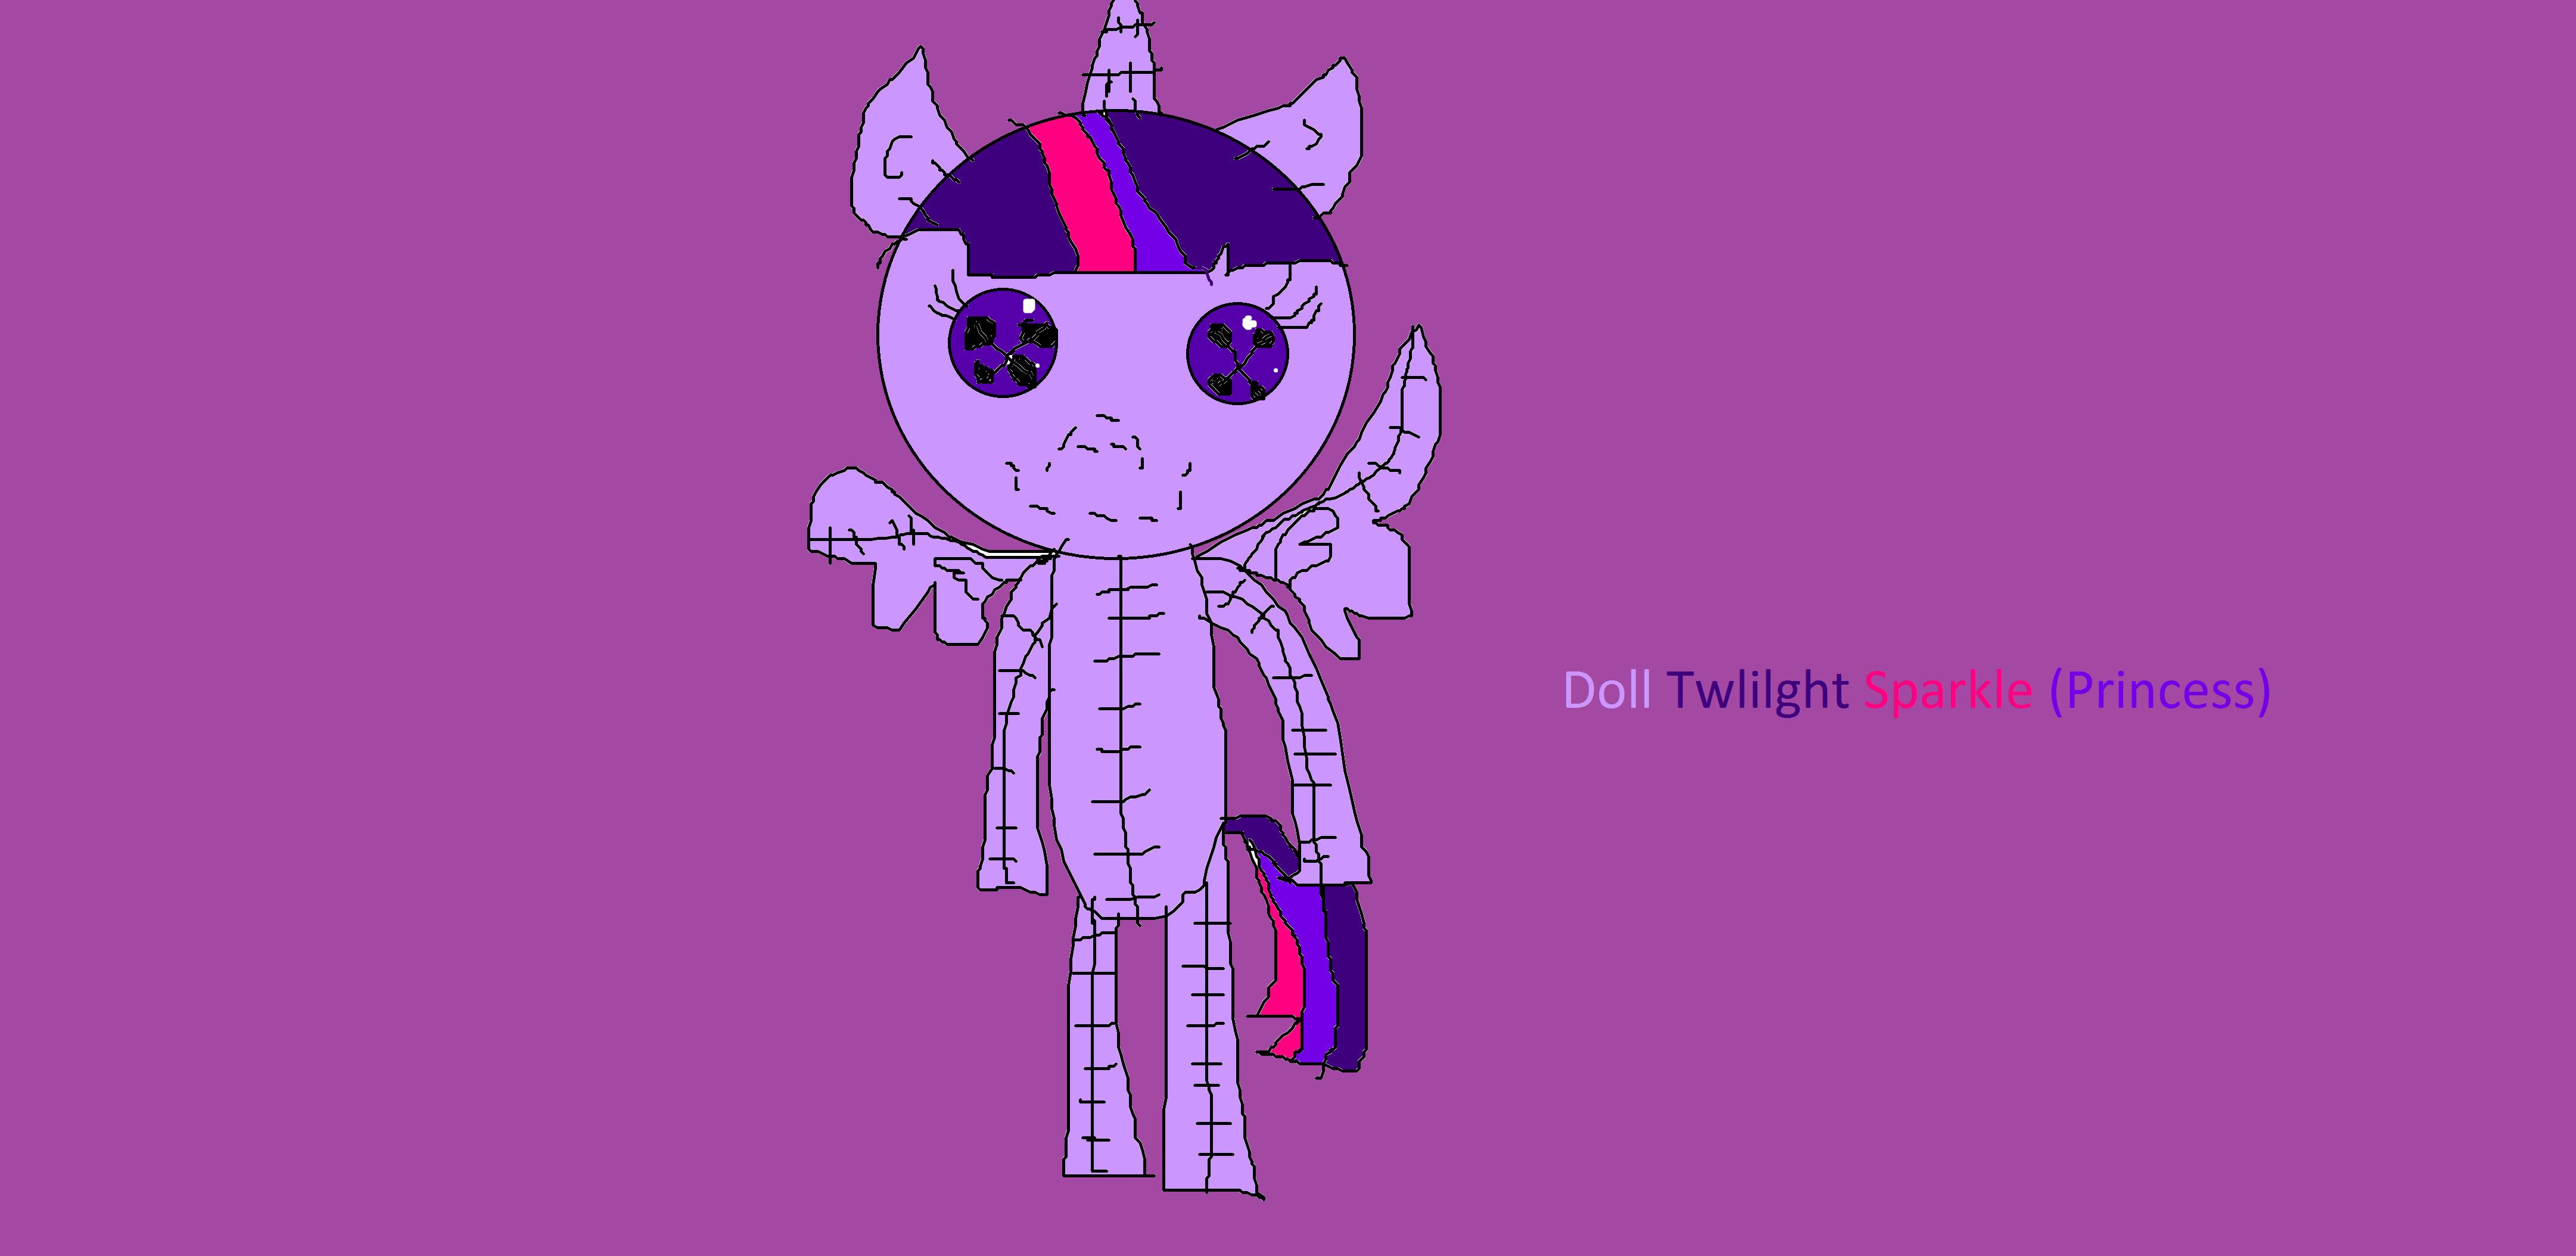 Princess Twlilght Sparkle Doll